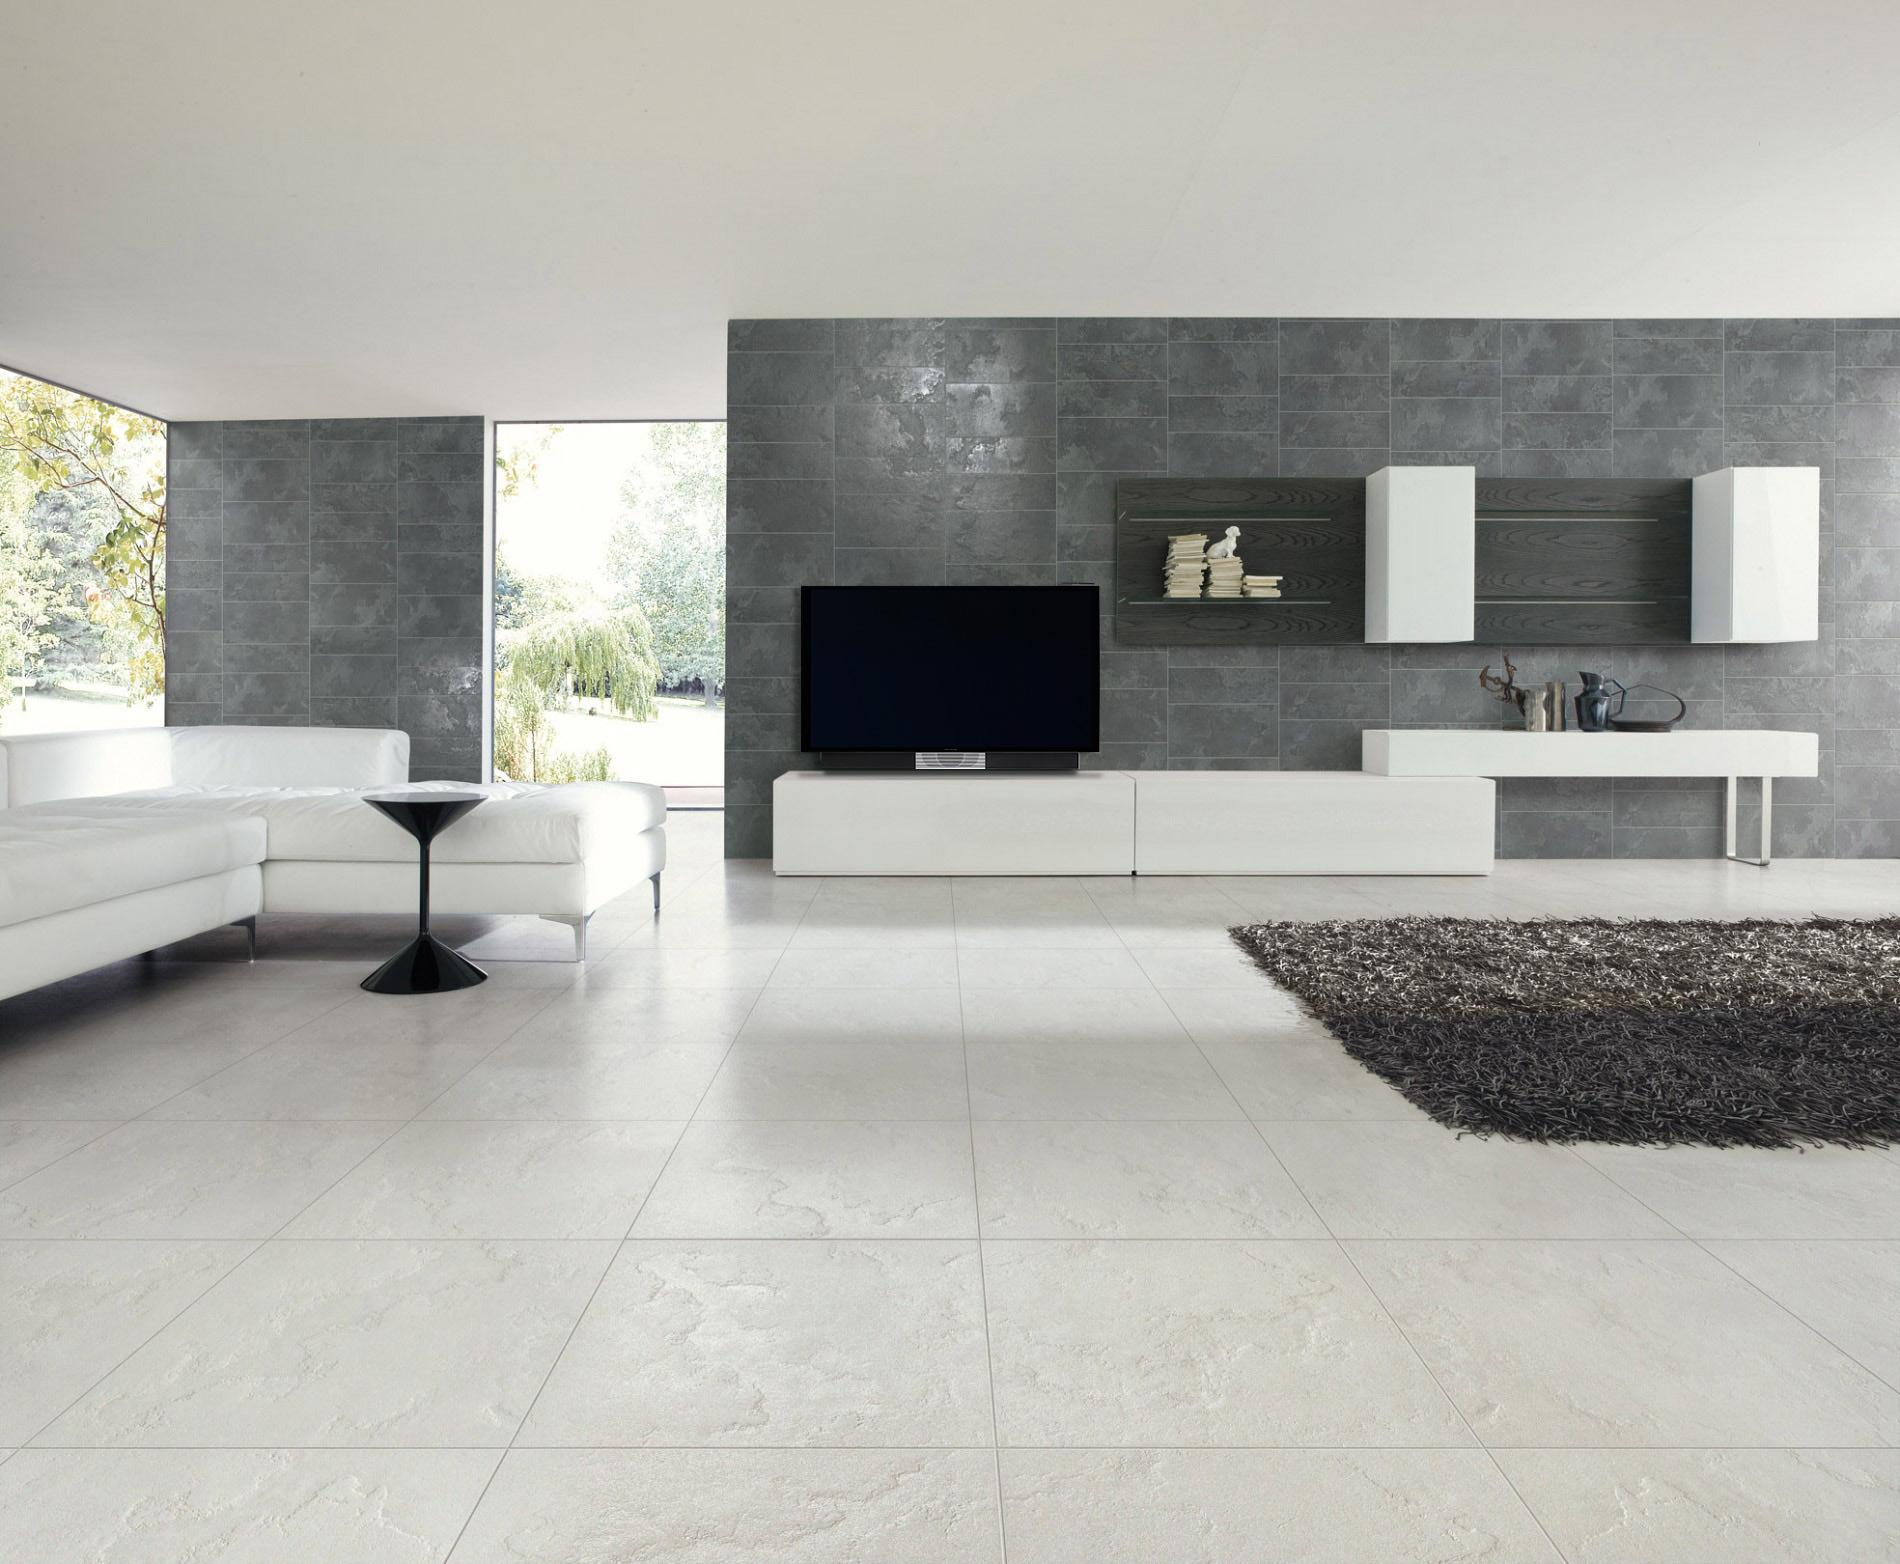 Introducing enigma a new metallic effect porcelain tile - Metallic fliesen ...